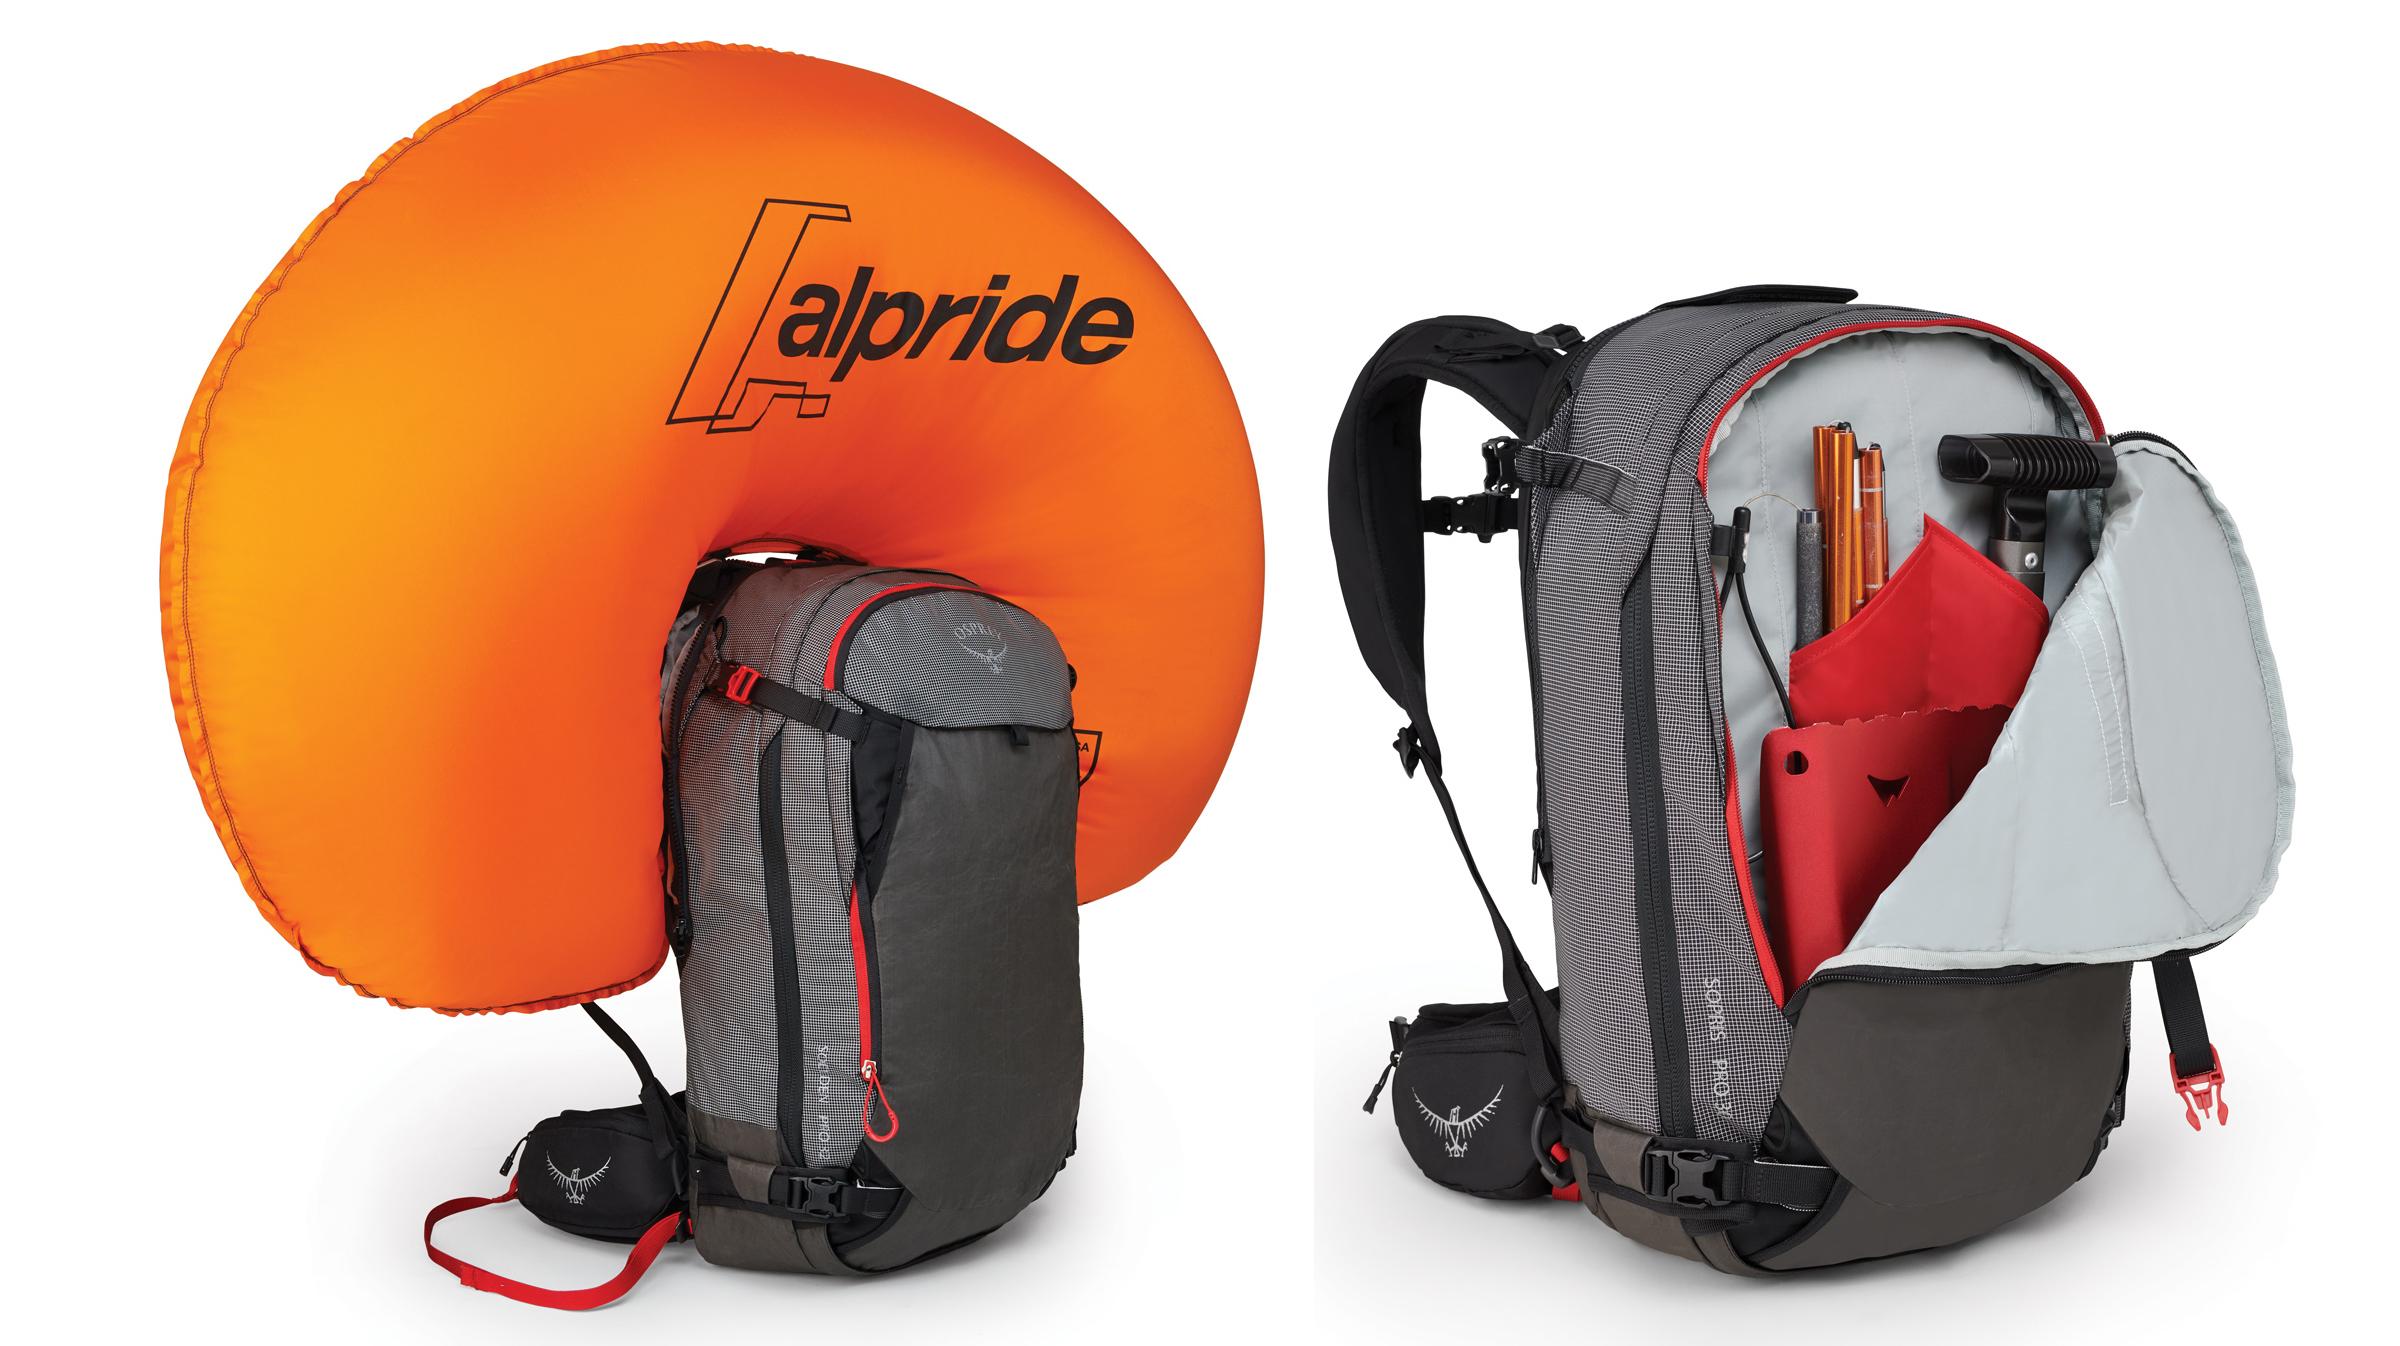 Osprey Sopris Pro Avy Airbag Pack a30